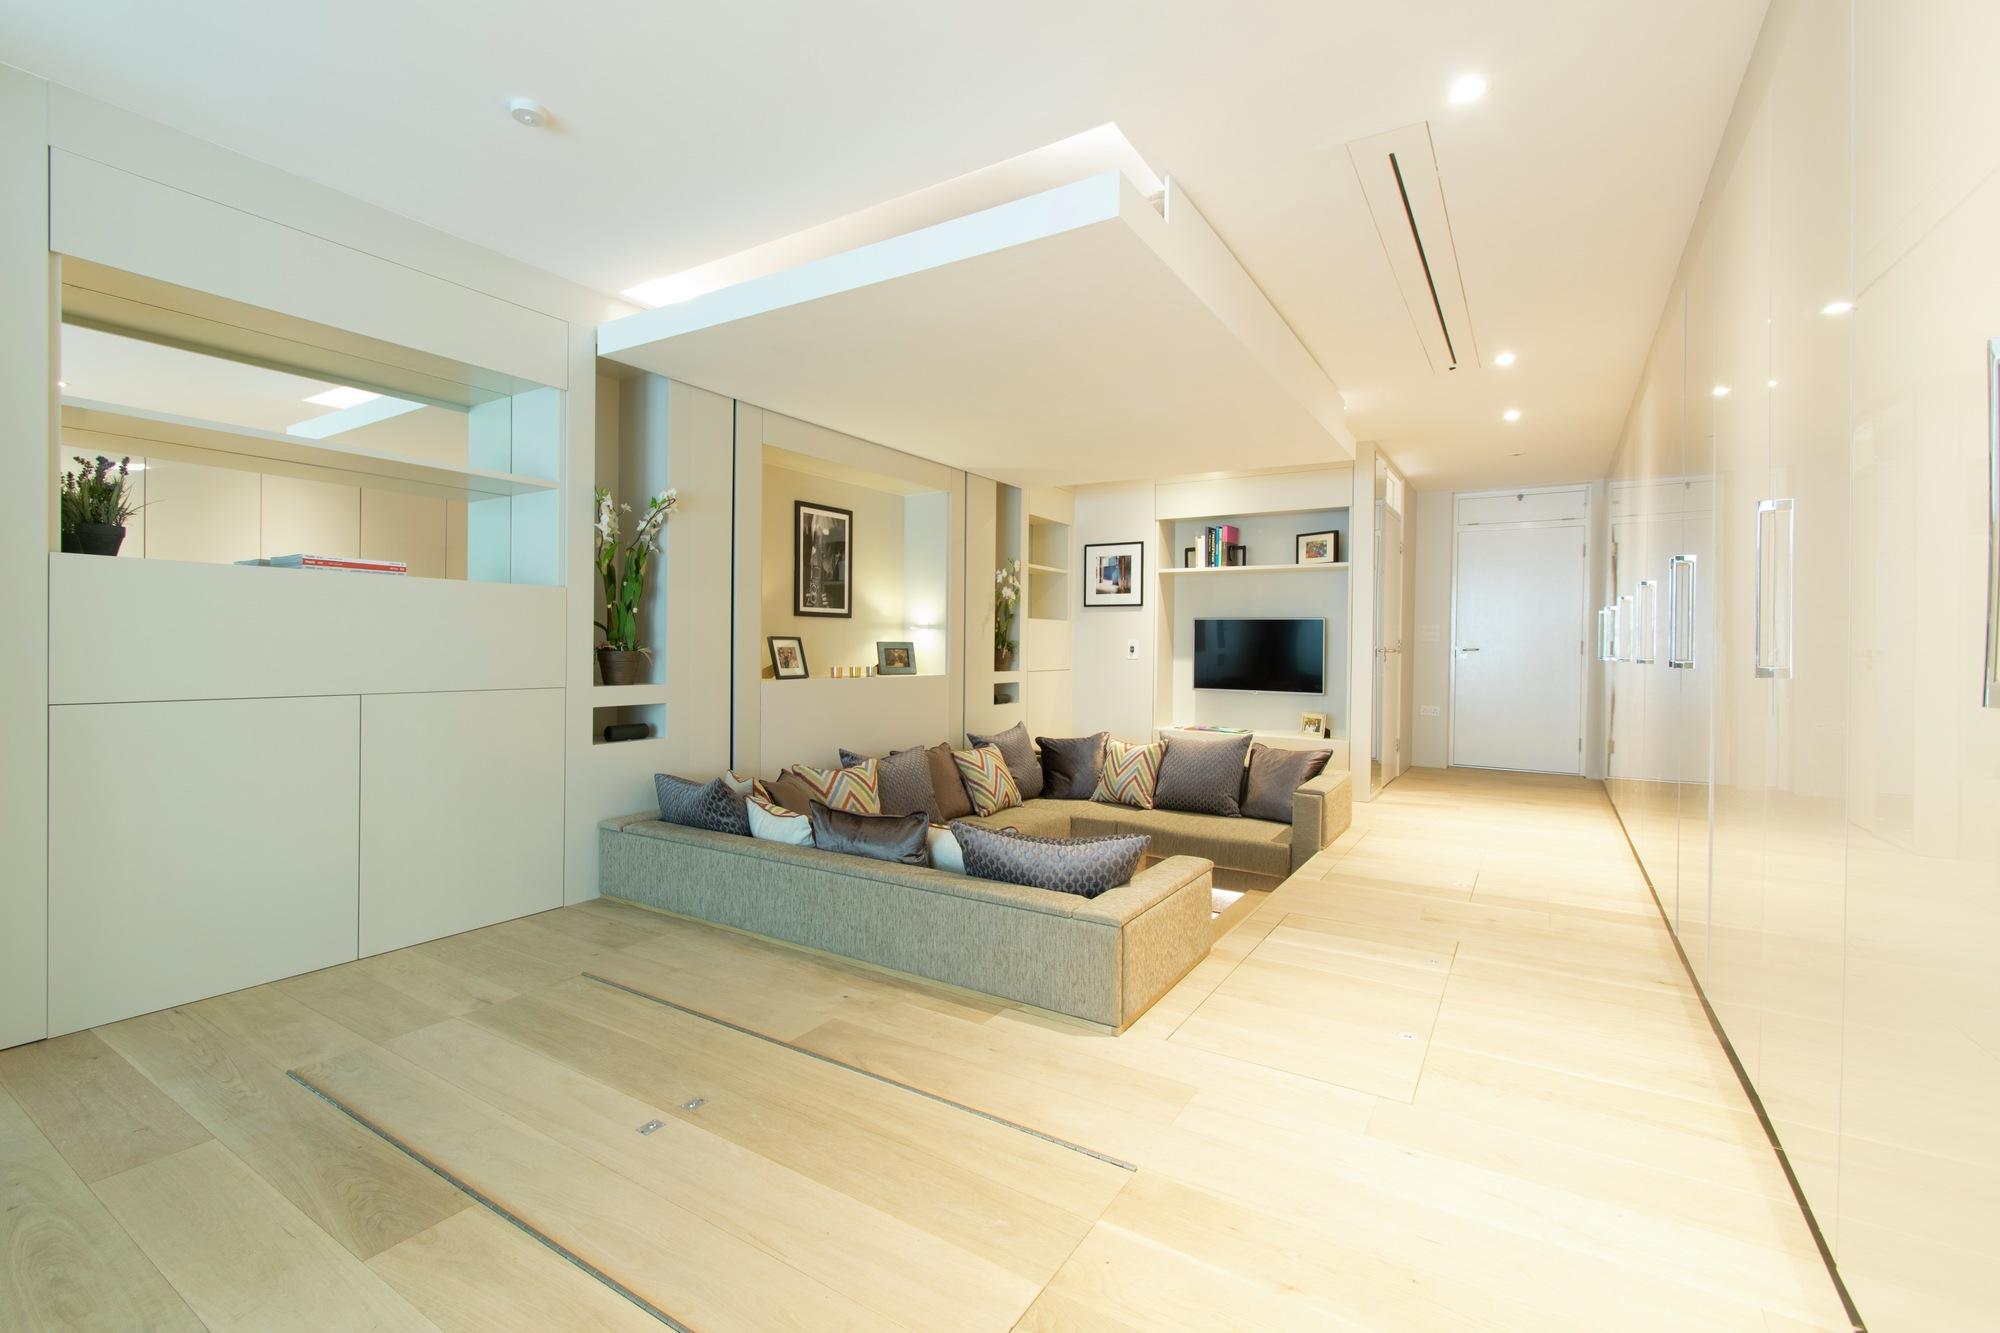 The Living Room Braamfontein